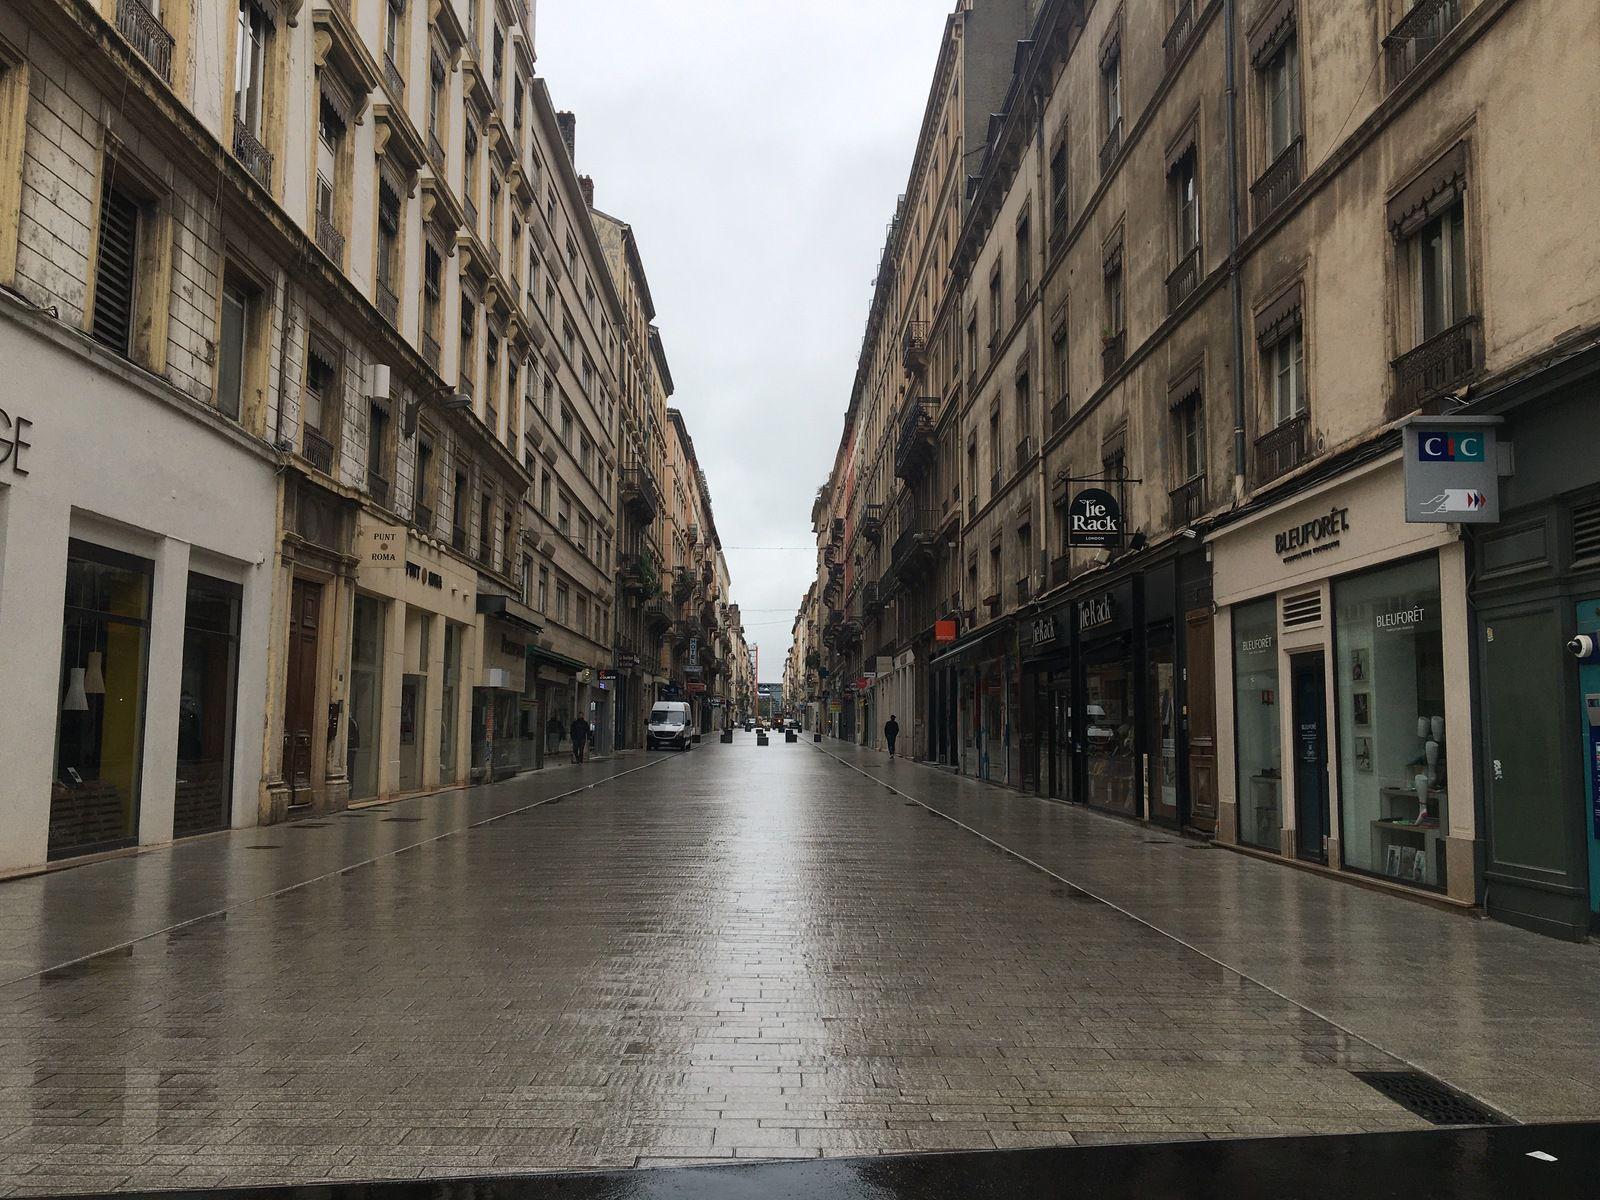 Il n'y a plus personne à Lyon ???